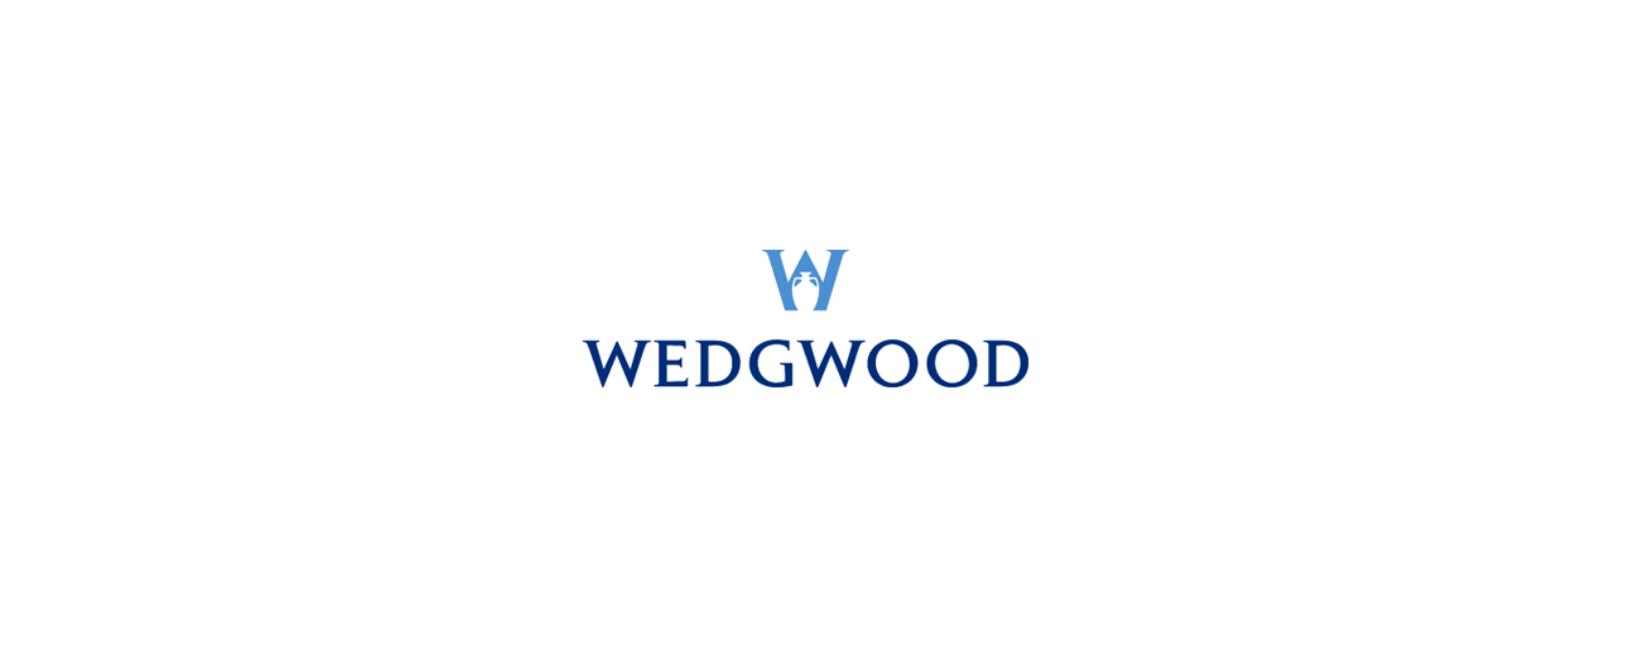 Wedgwood Promo Codes, Coupons 2021